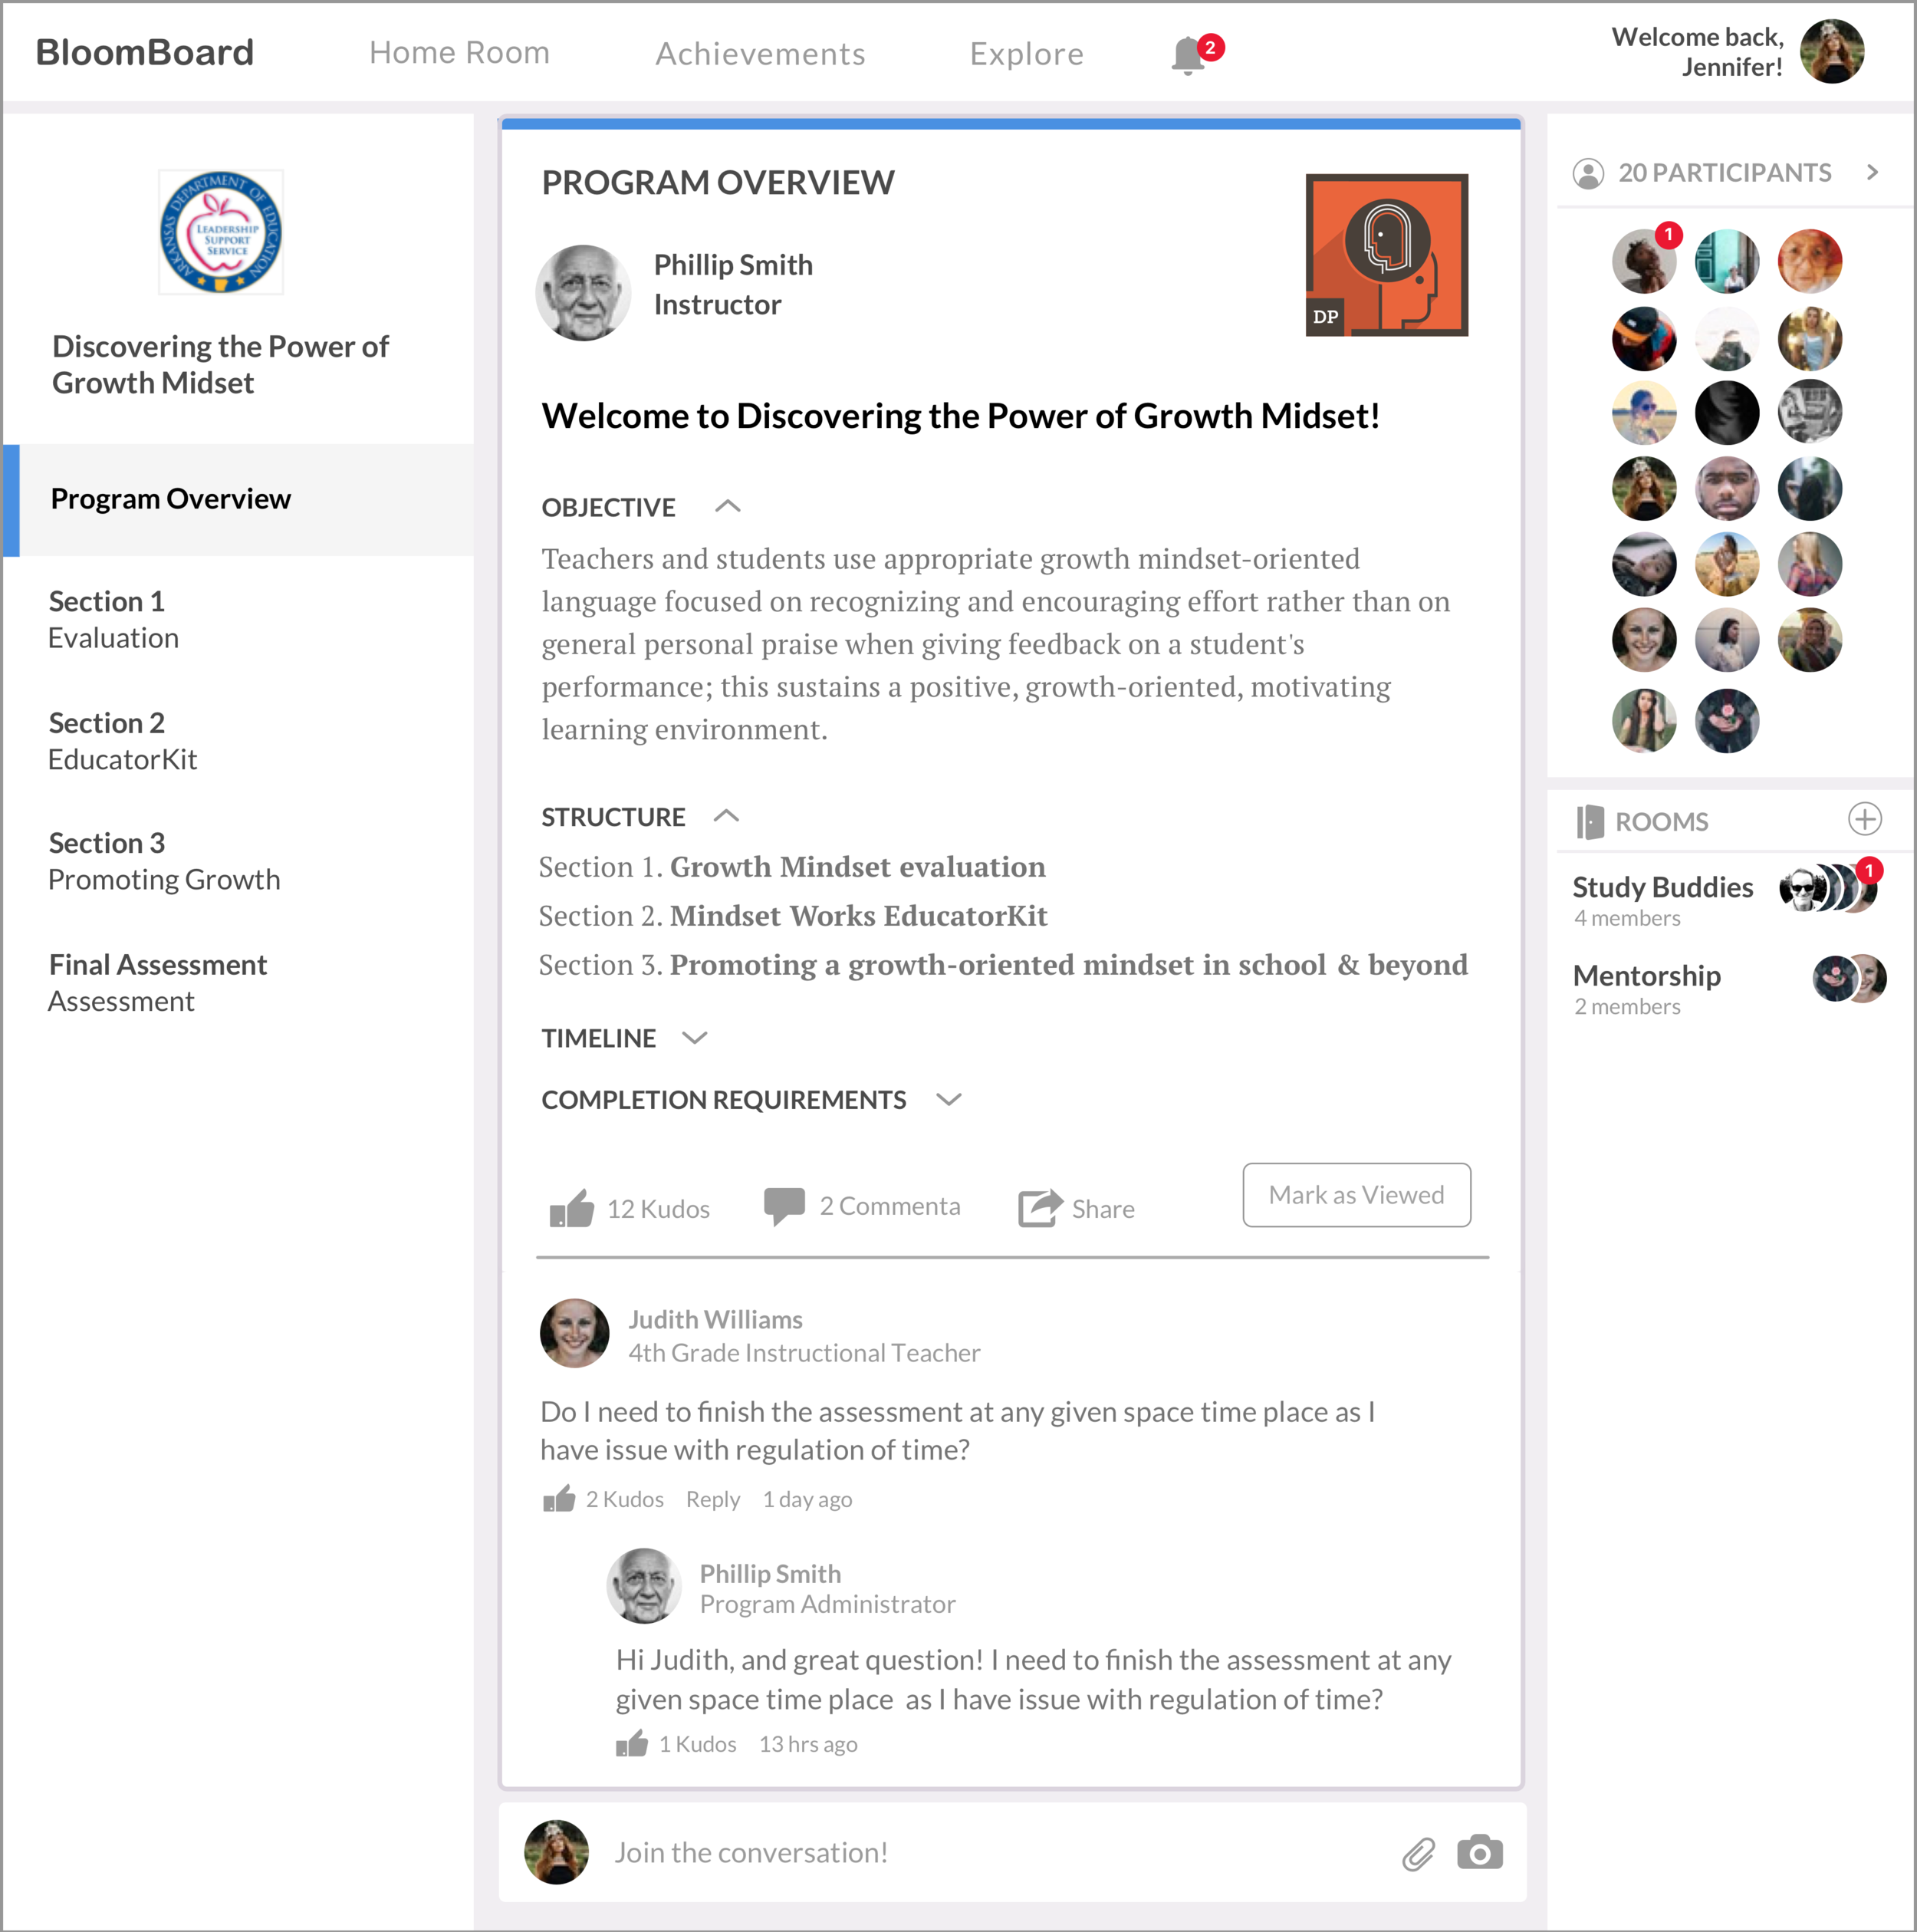 Program Overview redesign